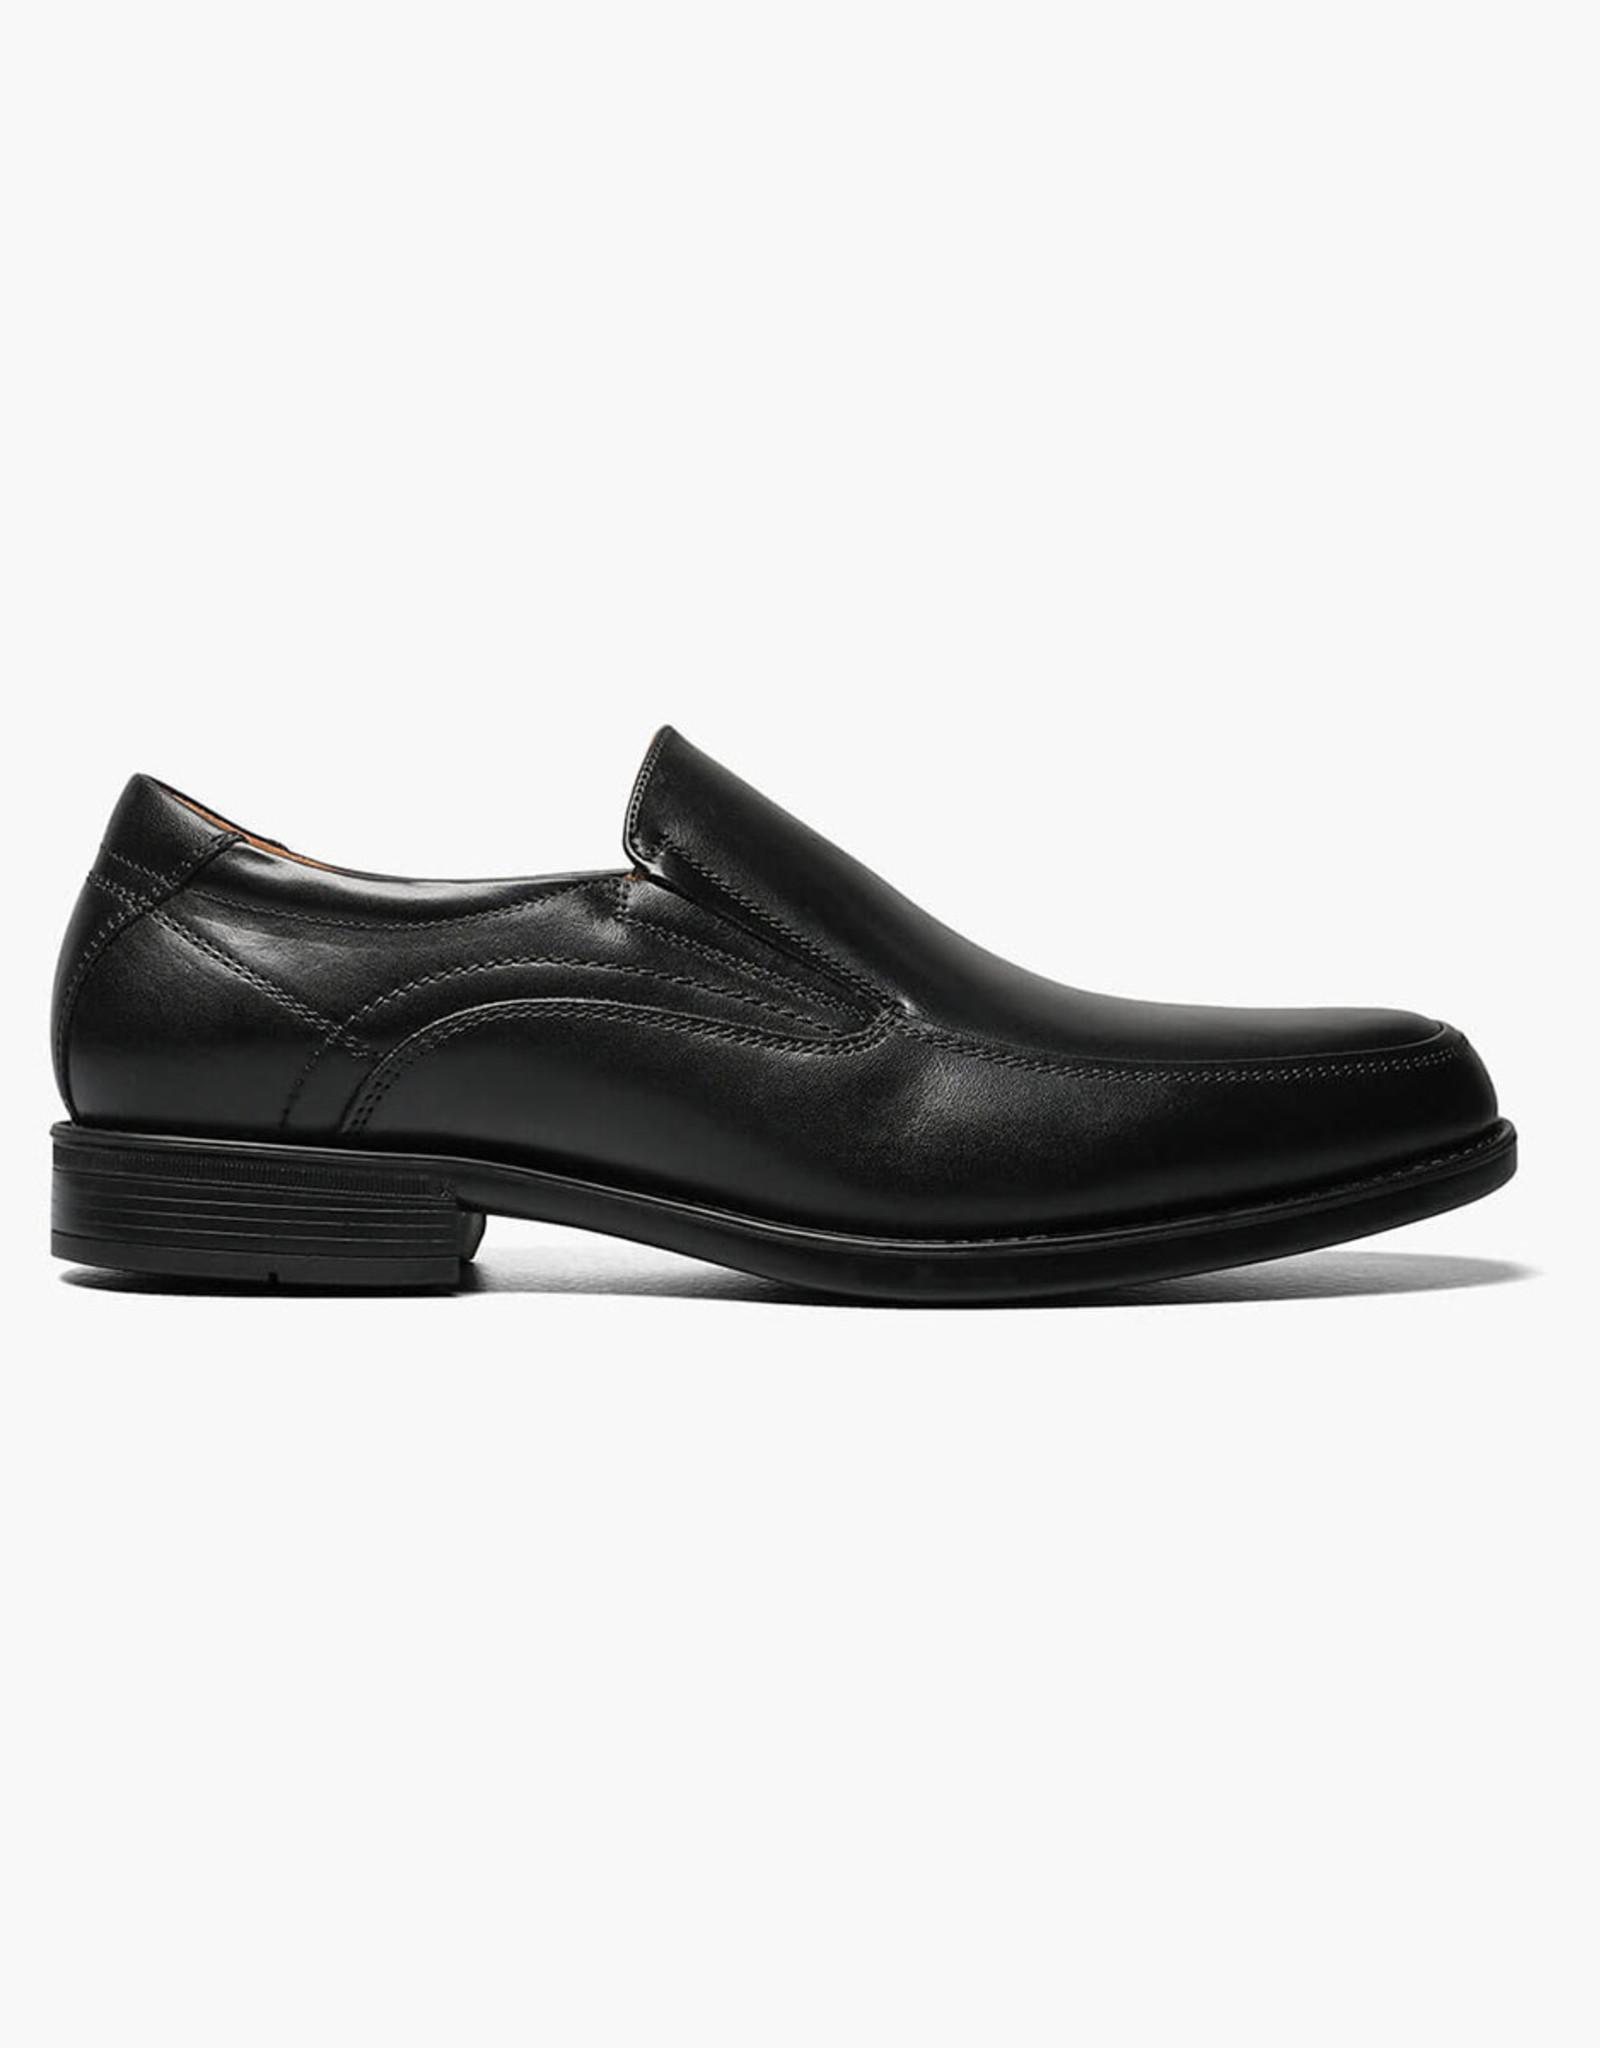 WEYCO 12137/0013E Black Slipon  Reg $165 Size 10